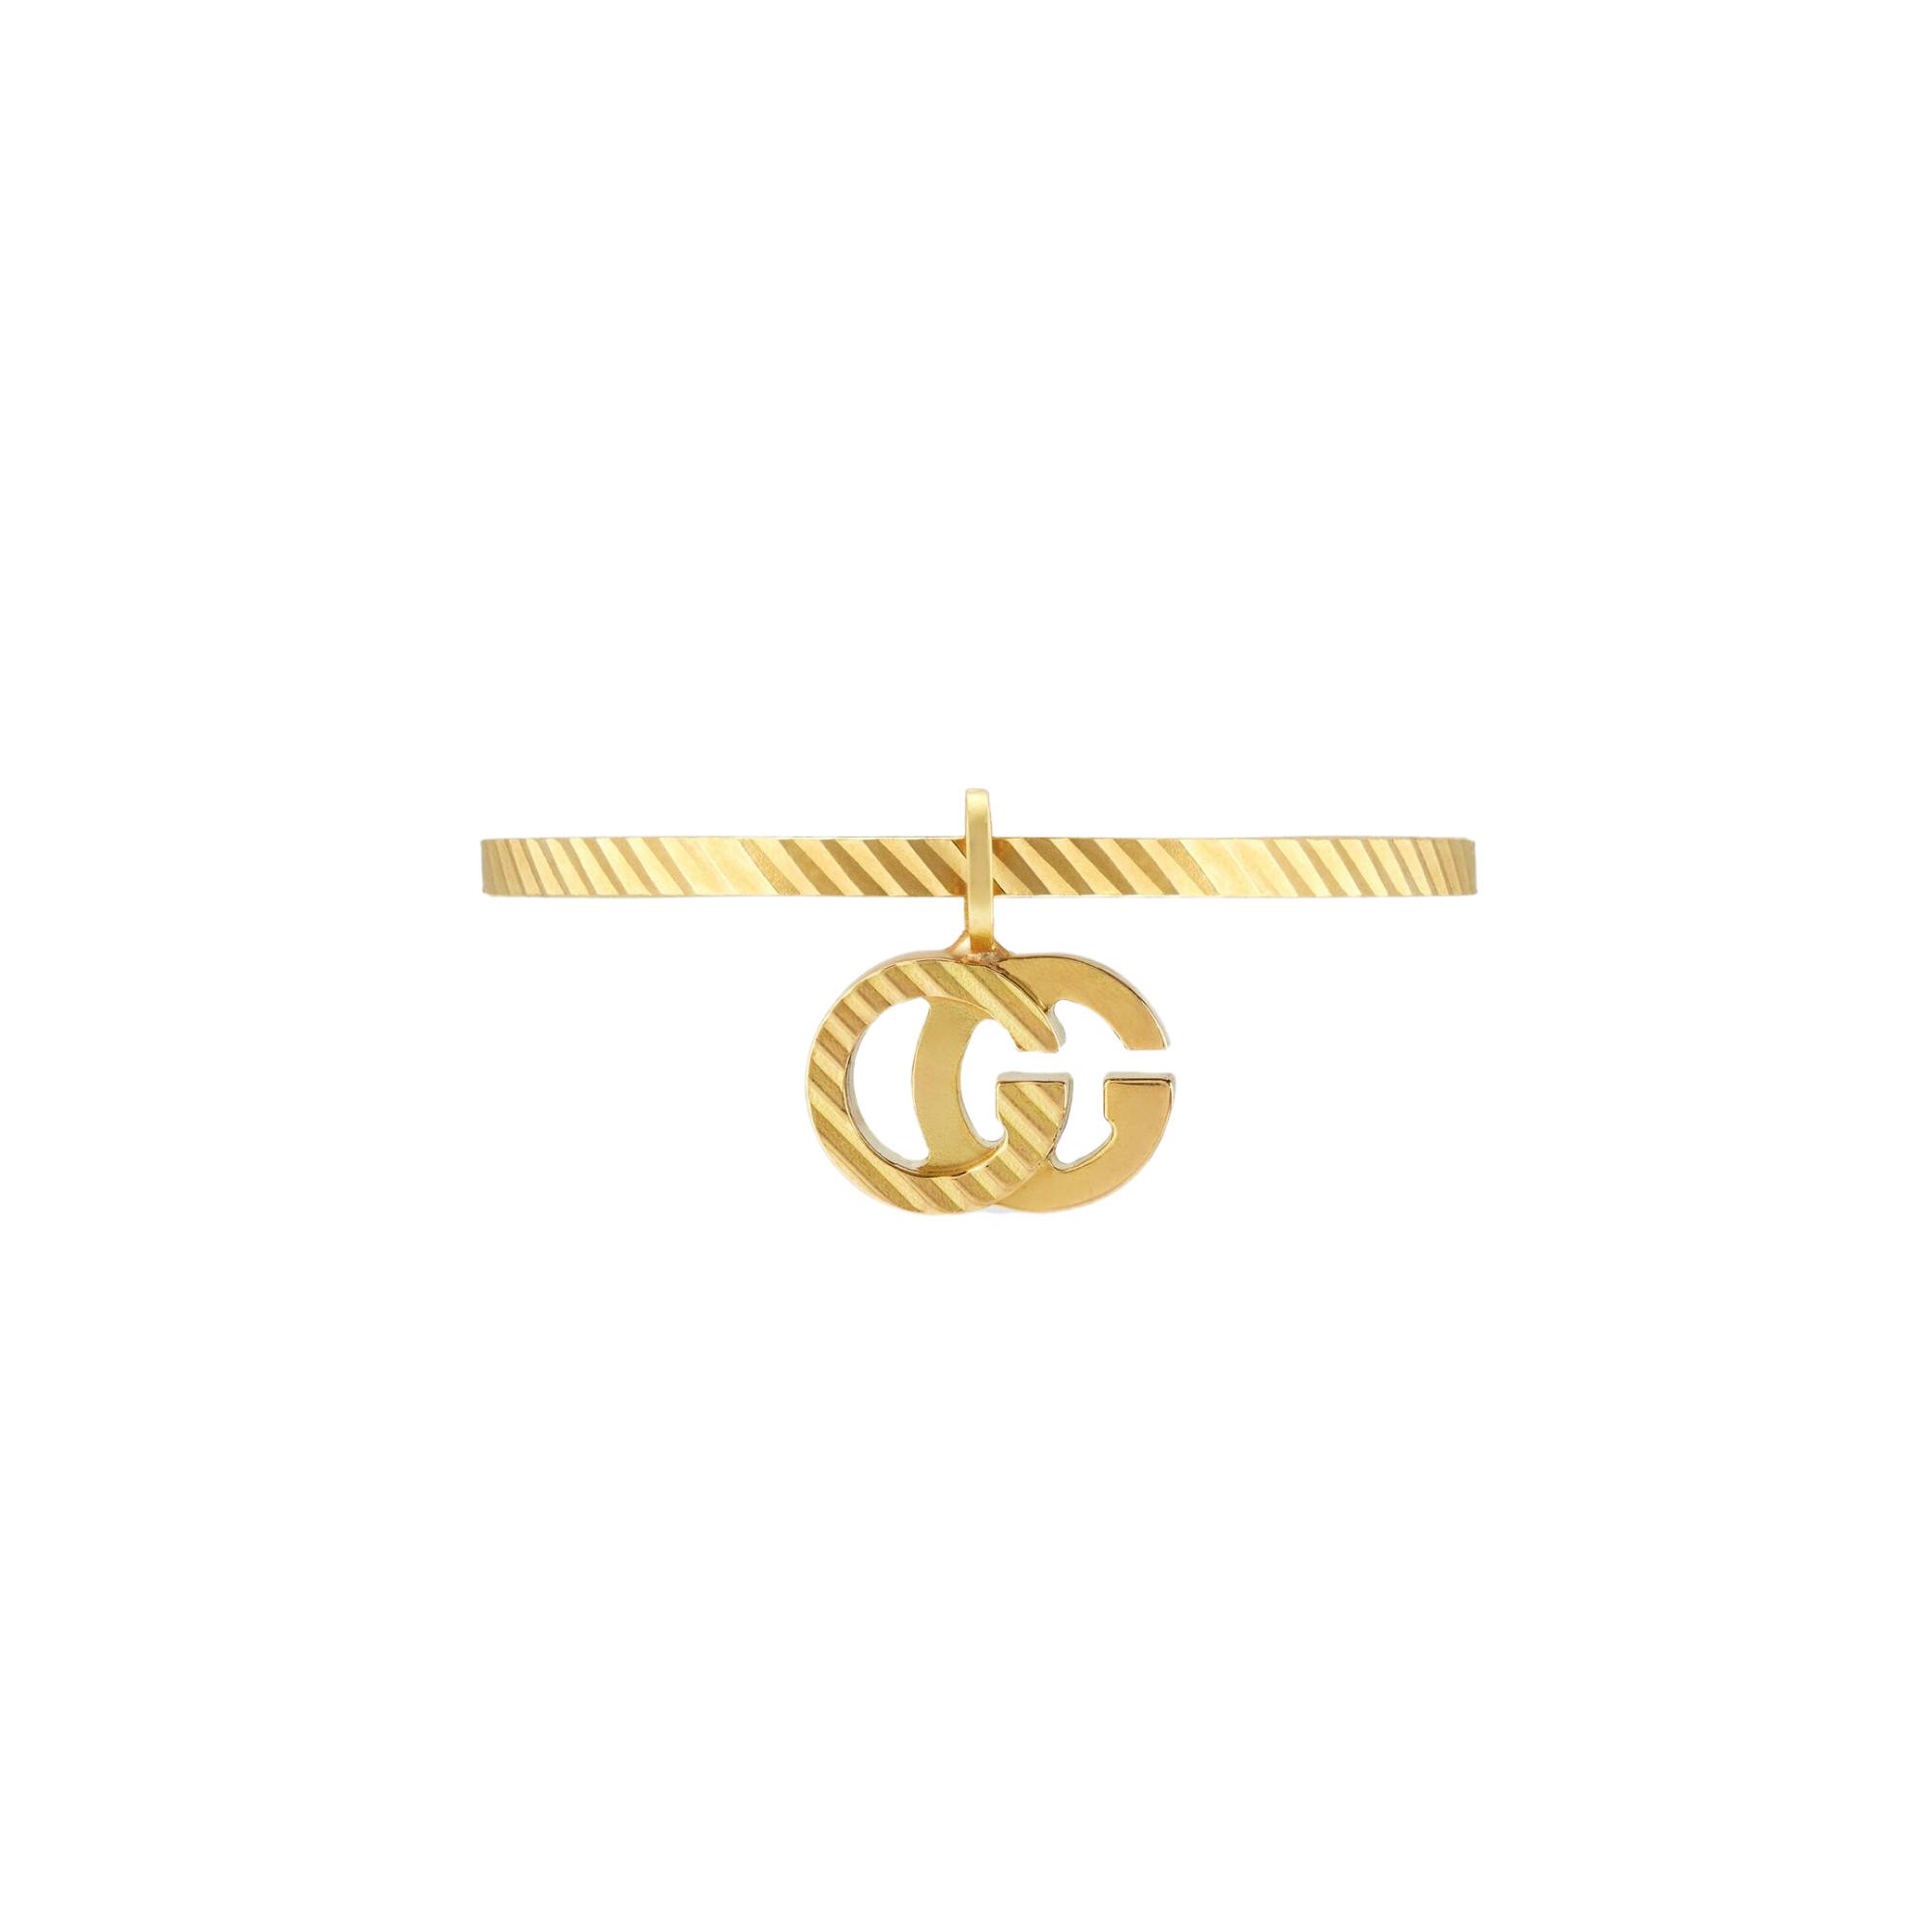 Light-Anello-GG-Running-18carati a ring gucci sconto discount